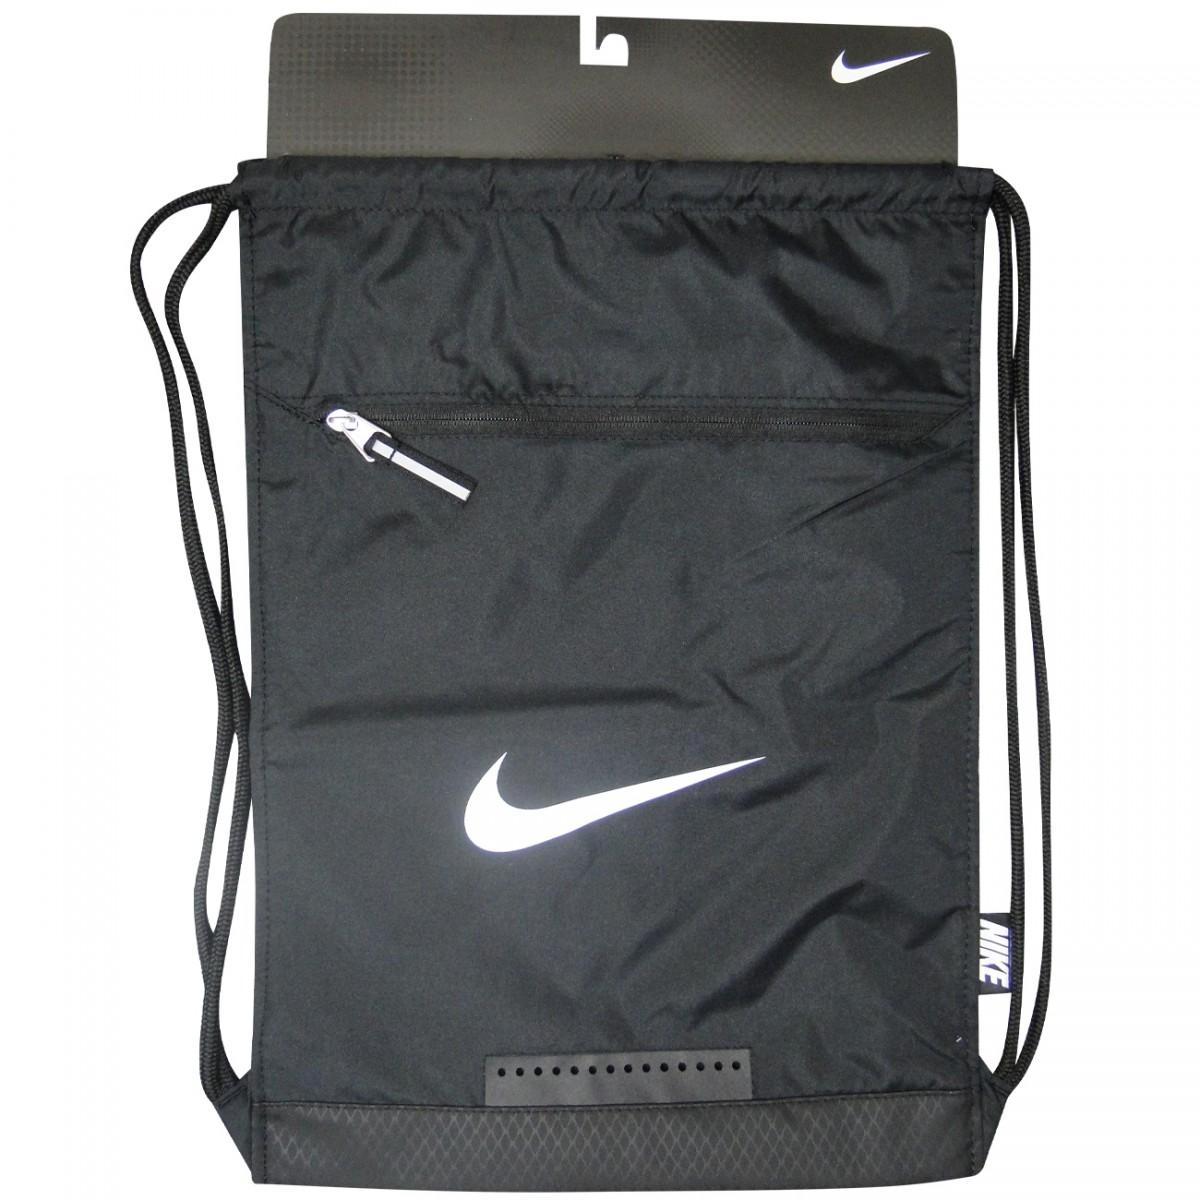 fb6948cfc Sacola Nike BA4694 BA4694 001 - Preto/Branco - Chuteira Nike, Adidas.  Sandalias Femininas. Sandy Calçados